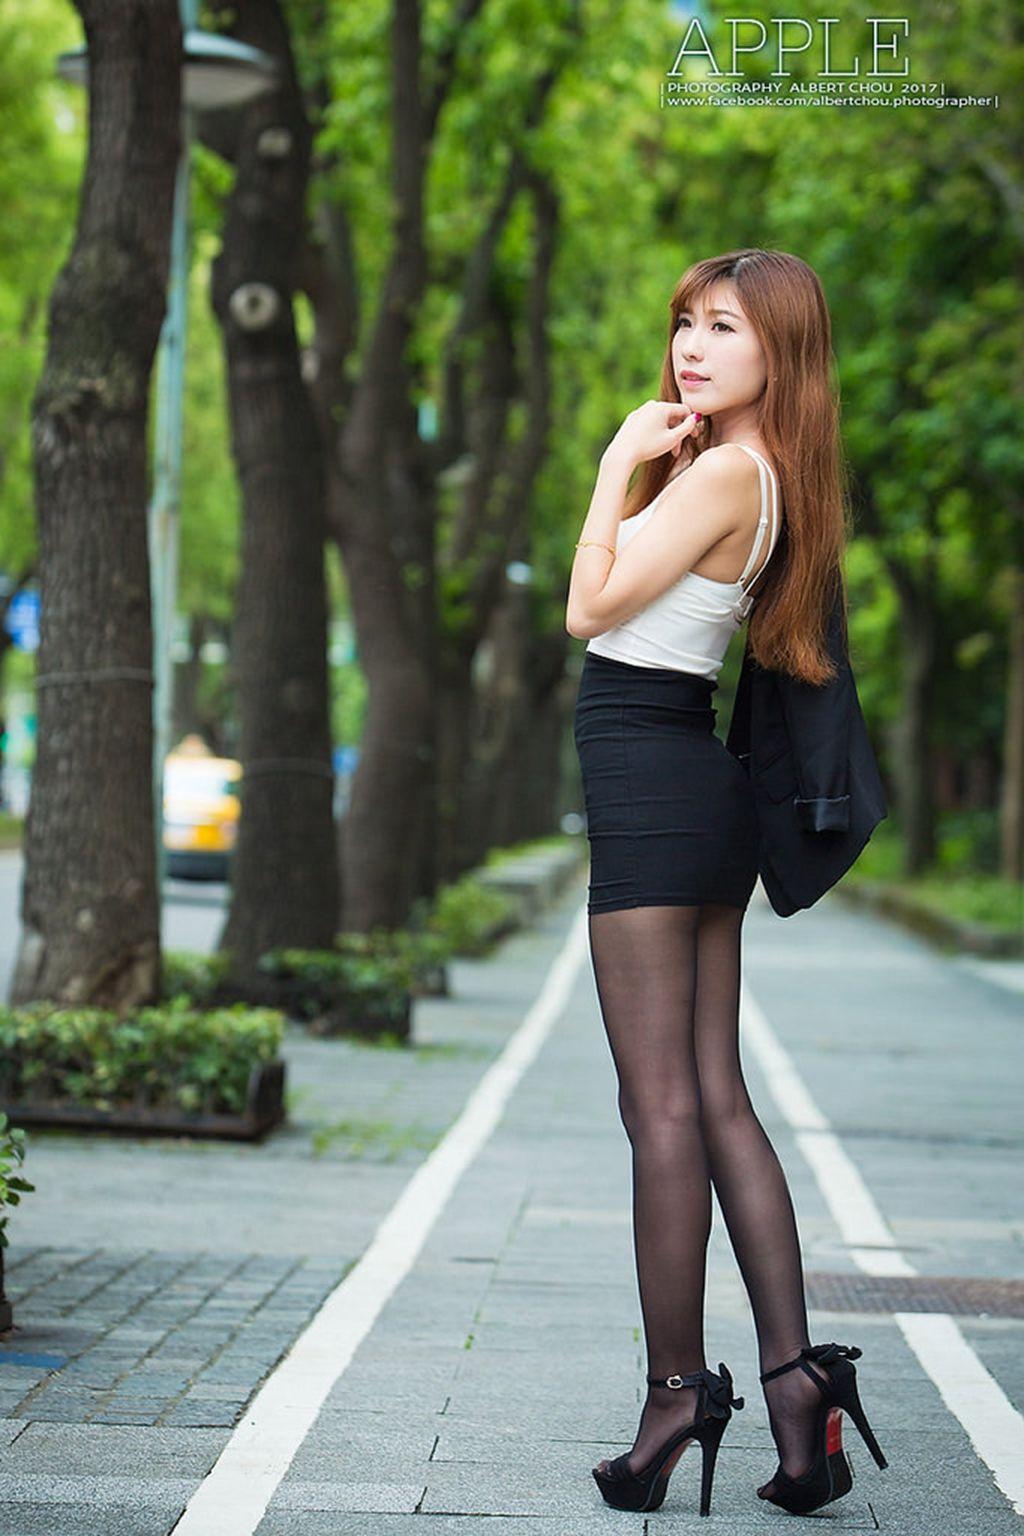 VOL.76 [台湾正妹]丝袜美腿OL美女街拍美臀丝袜女郎街拍黑丝:张闵净(小净)超高清个人性感漂亮大图(60P)